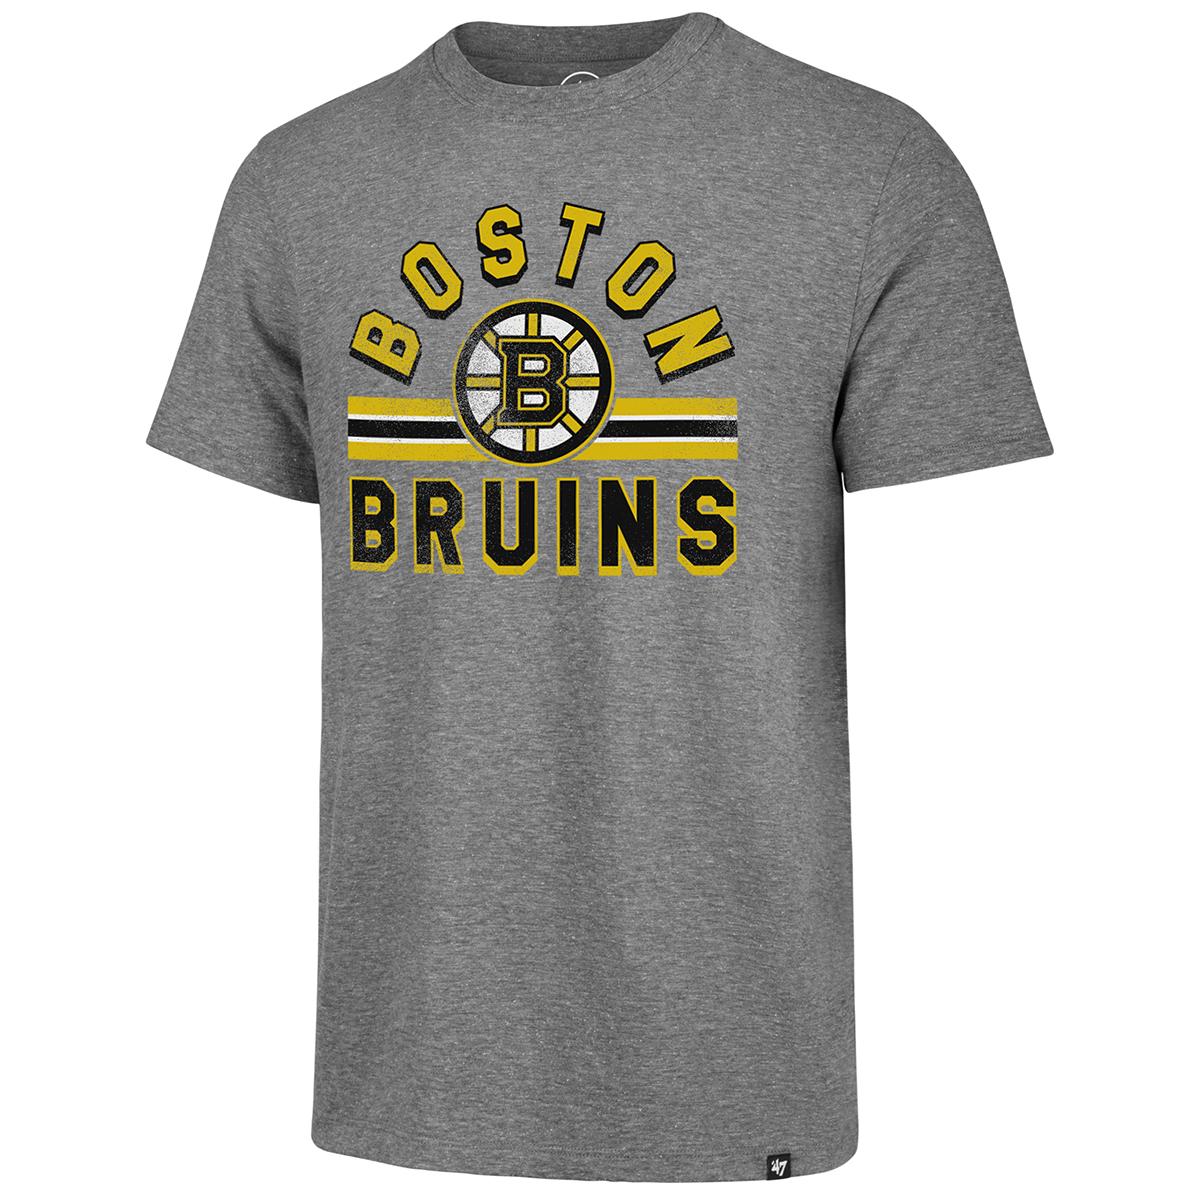 Boston Bruins Men's Team Stripe '47 Match Short-Sleeve Tee - Black, XL